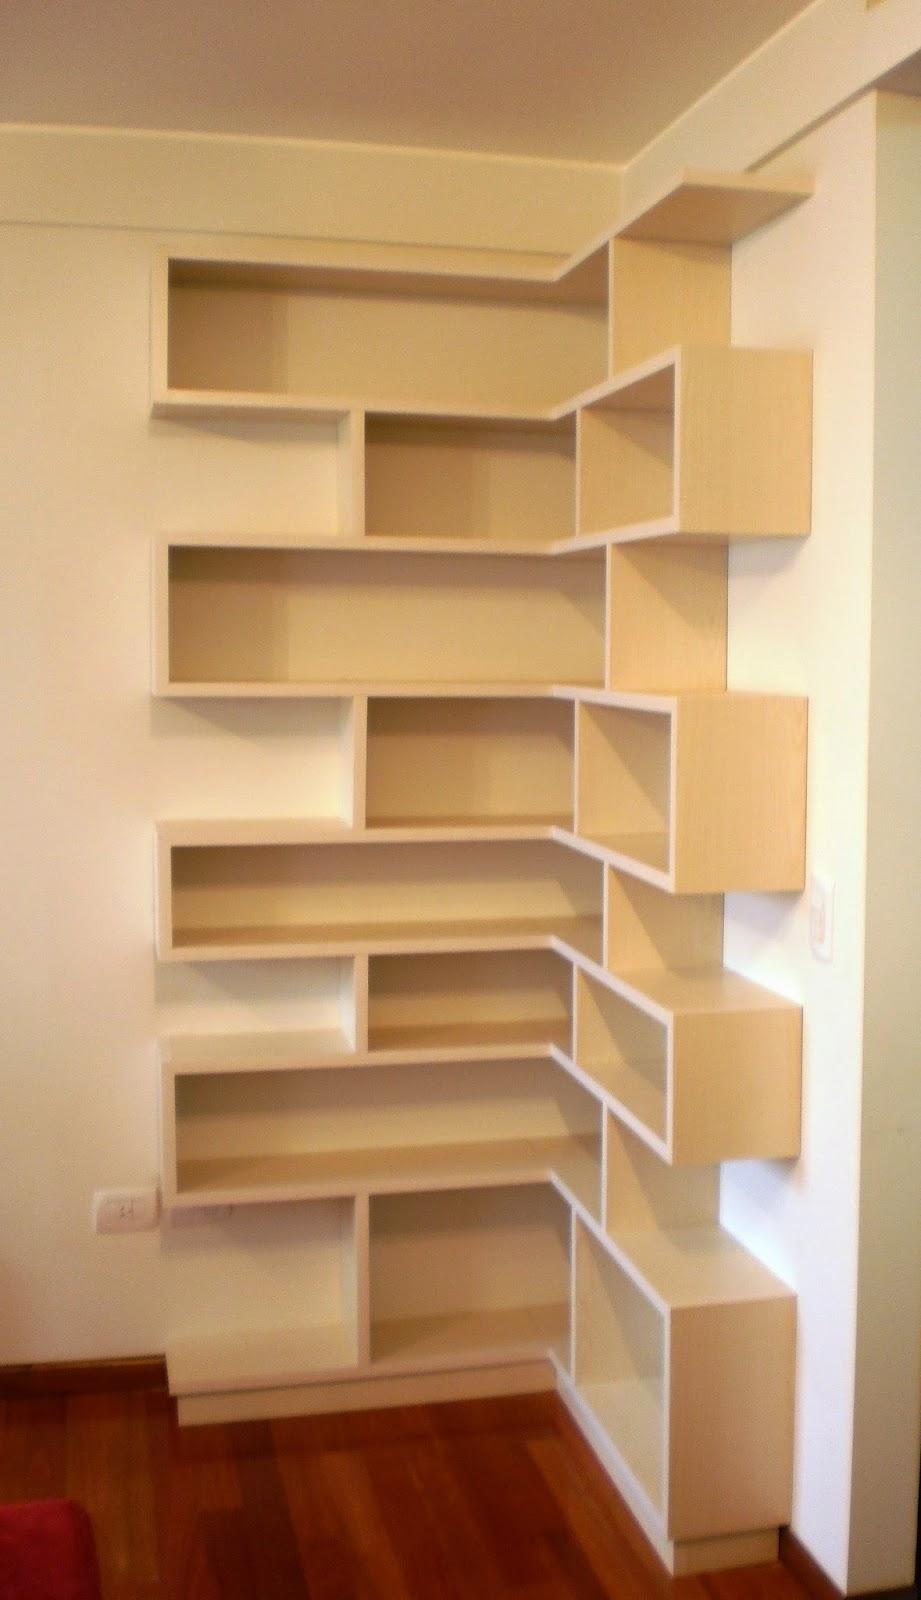 Modulor muebles biblioteca en esquina for Libro de muebles de melamina